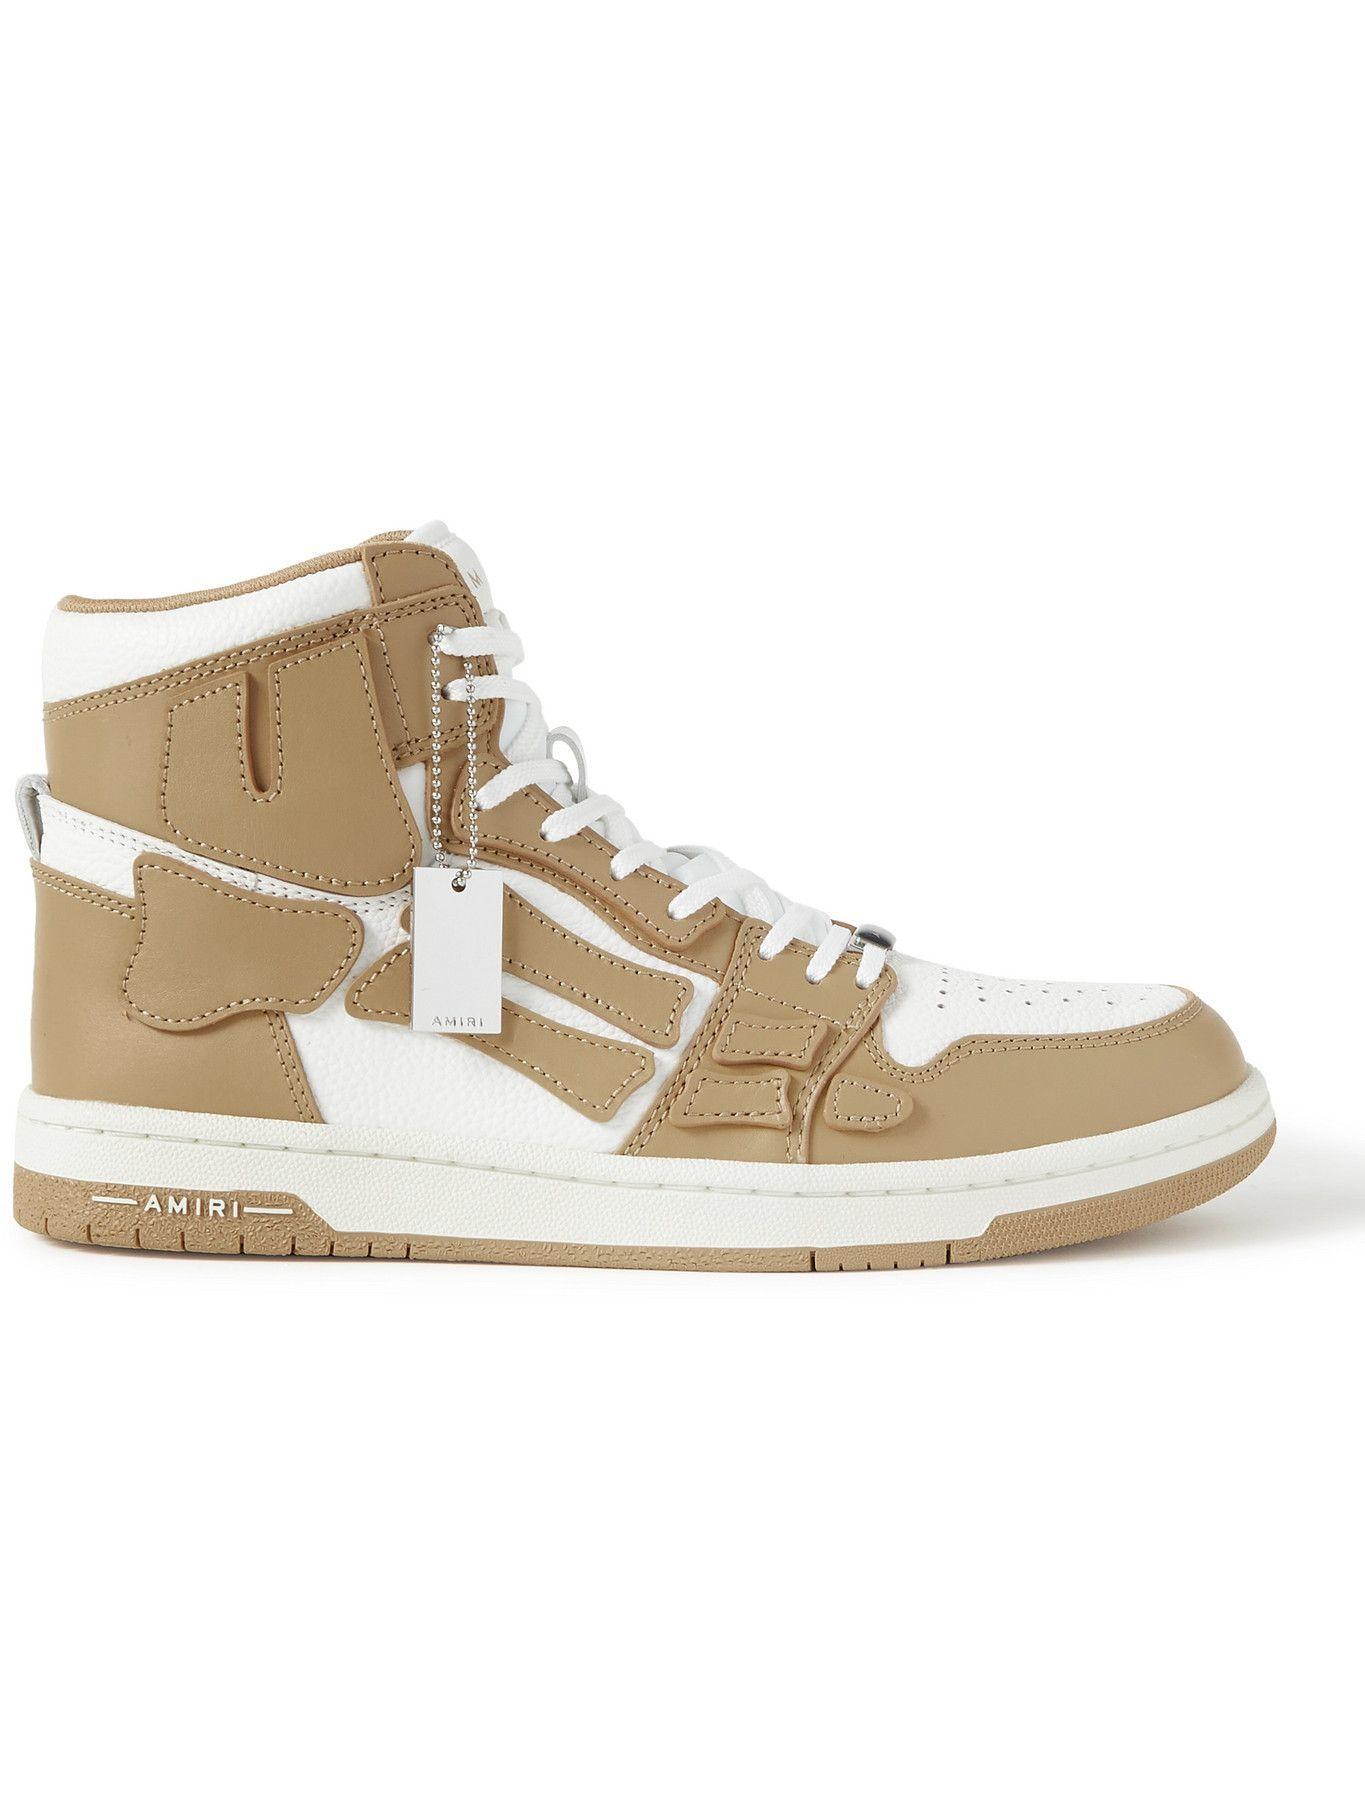 Photo: AMIRI - Skel-Top Colour-Block Leather High-Top Sneakers - Brown